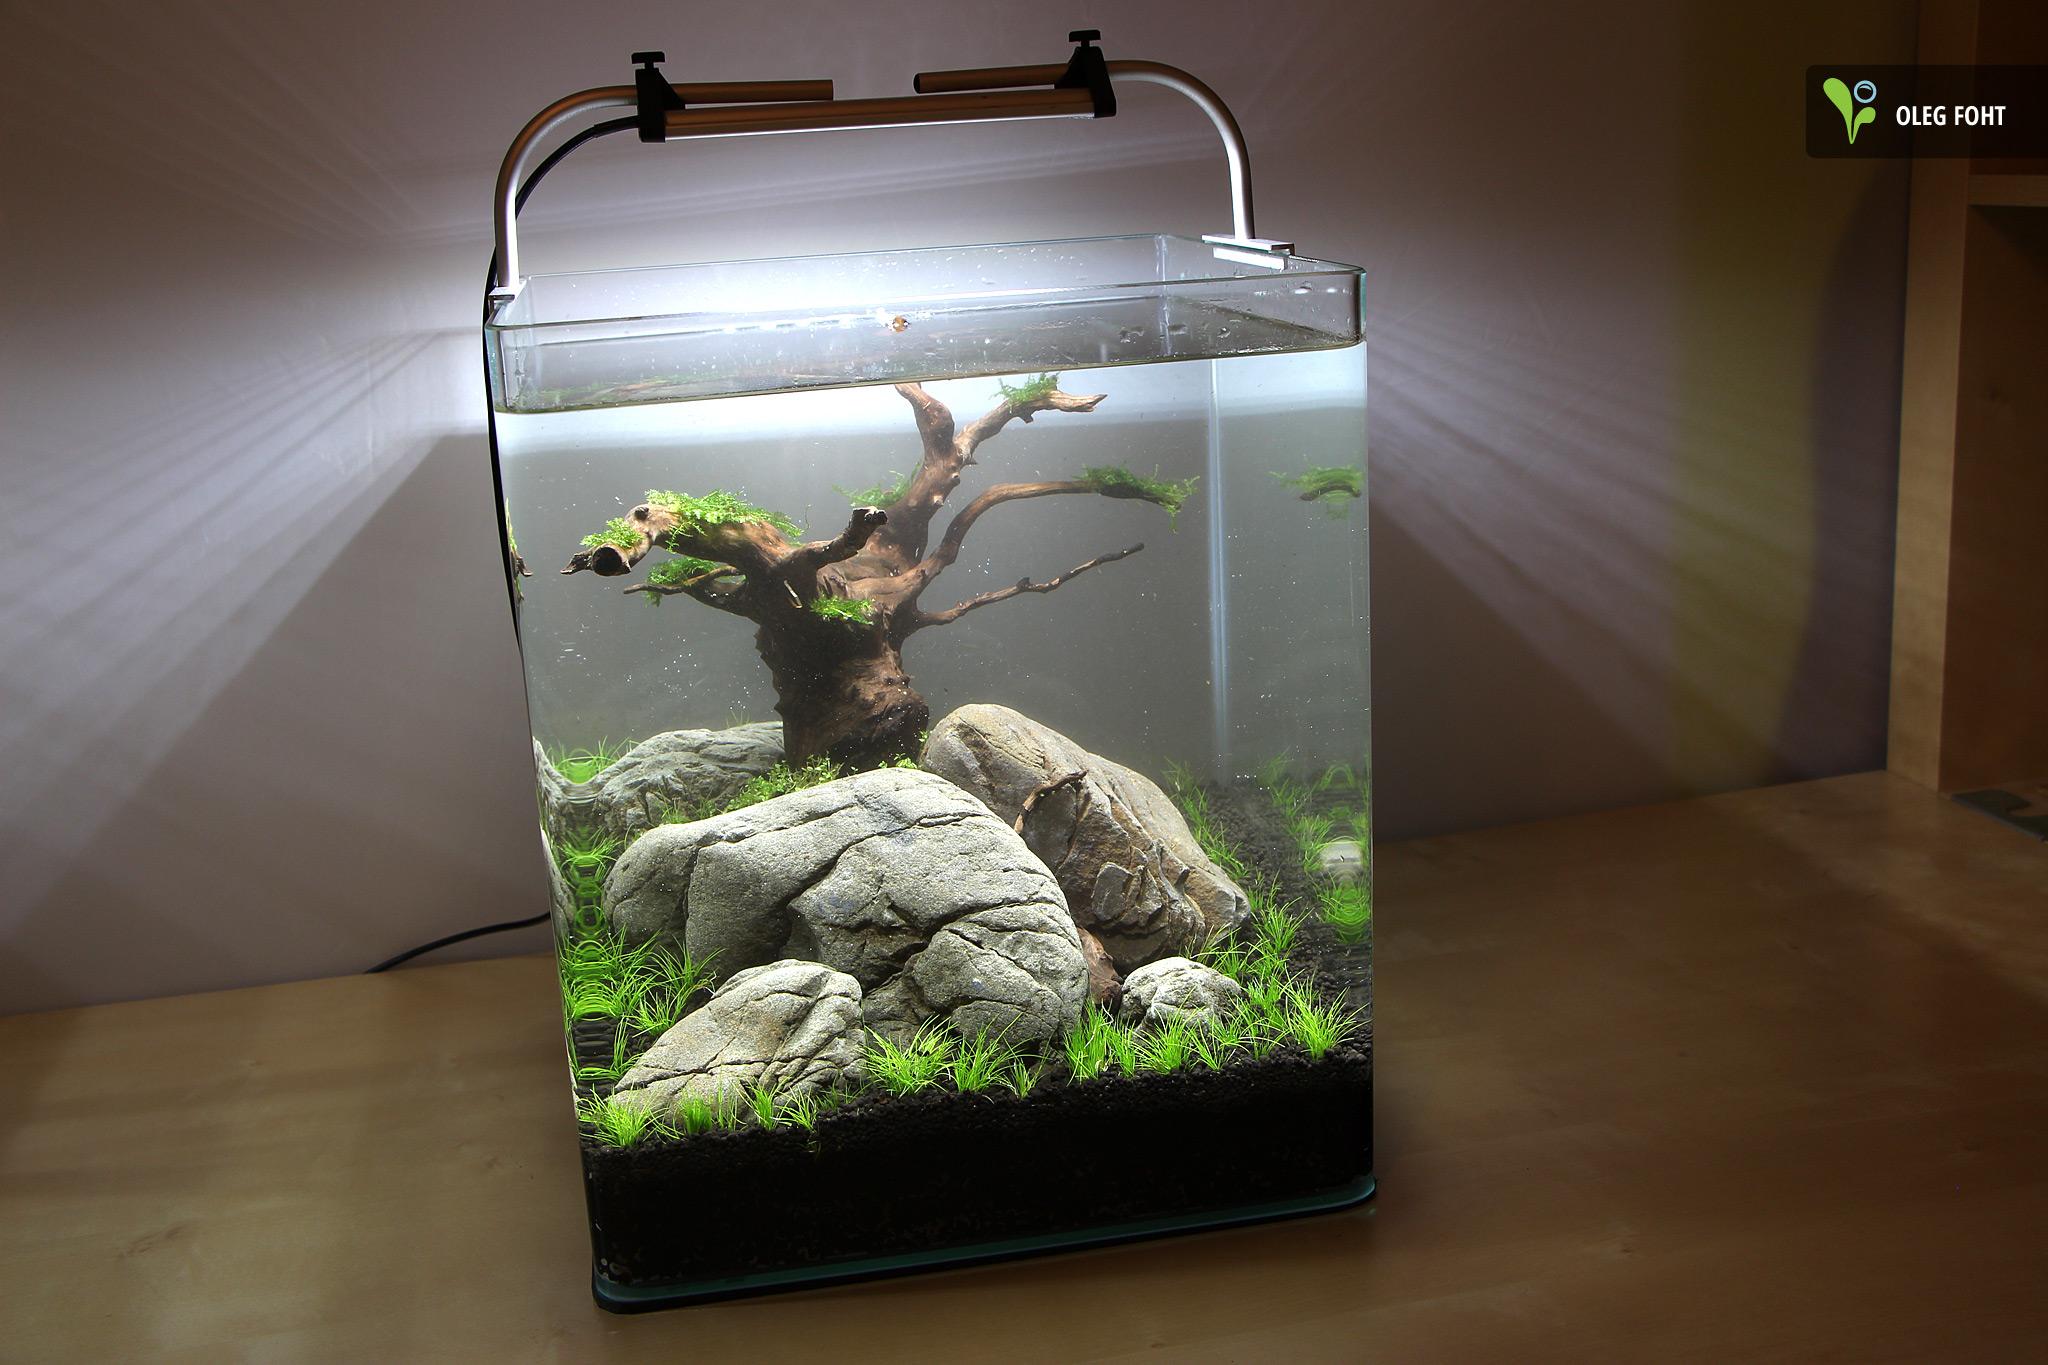 bicostone herzstein der ideale stein f r das aquascaping naturaquarium nano aquarium. Black Bedroom Furniture Sets. Home Design Ideas